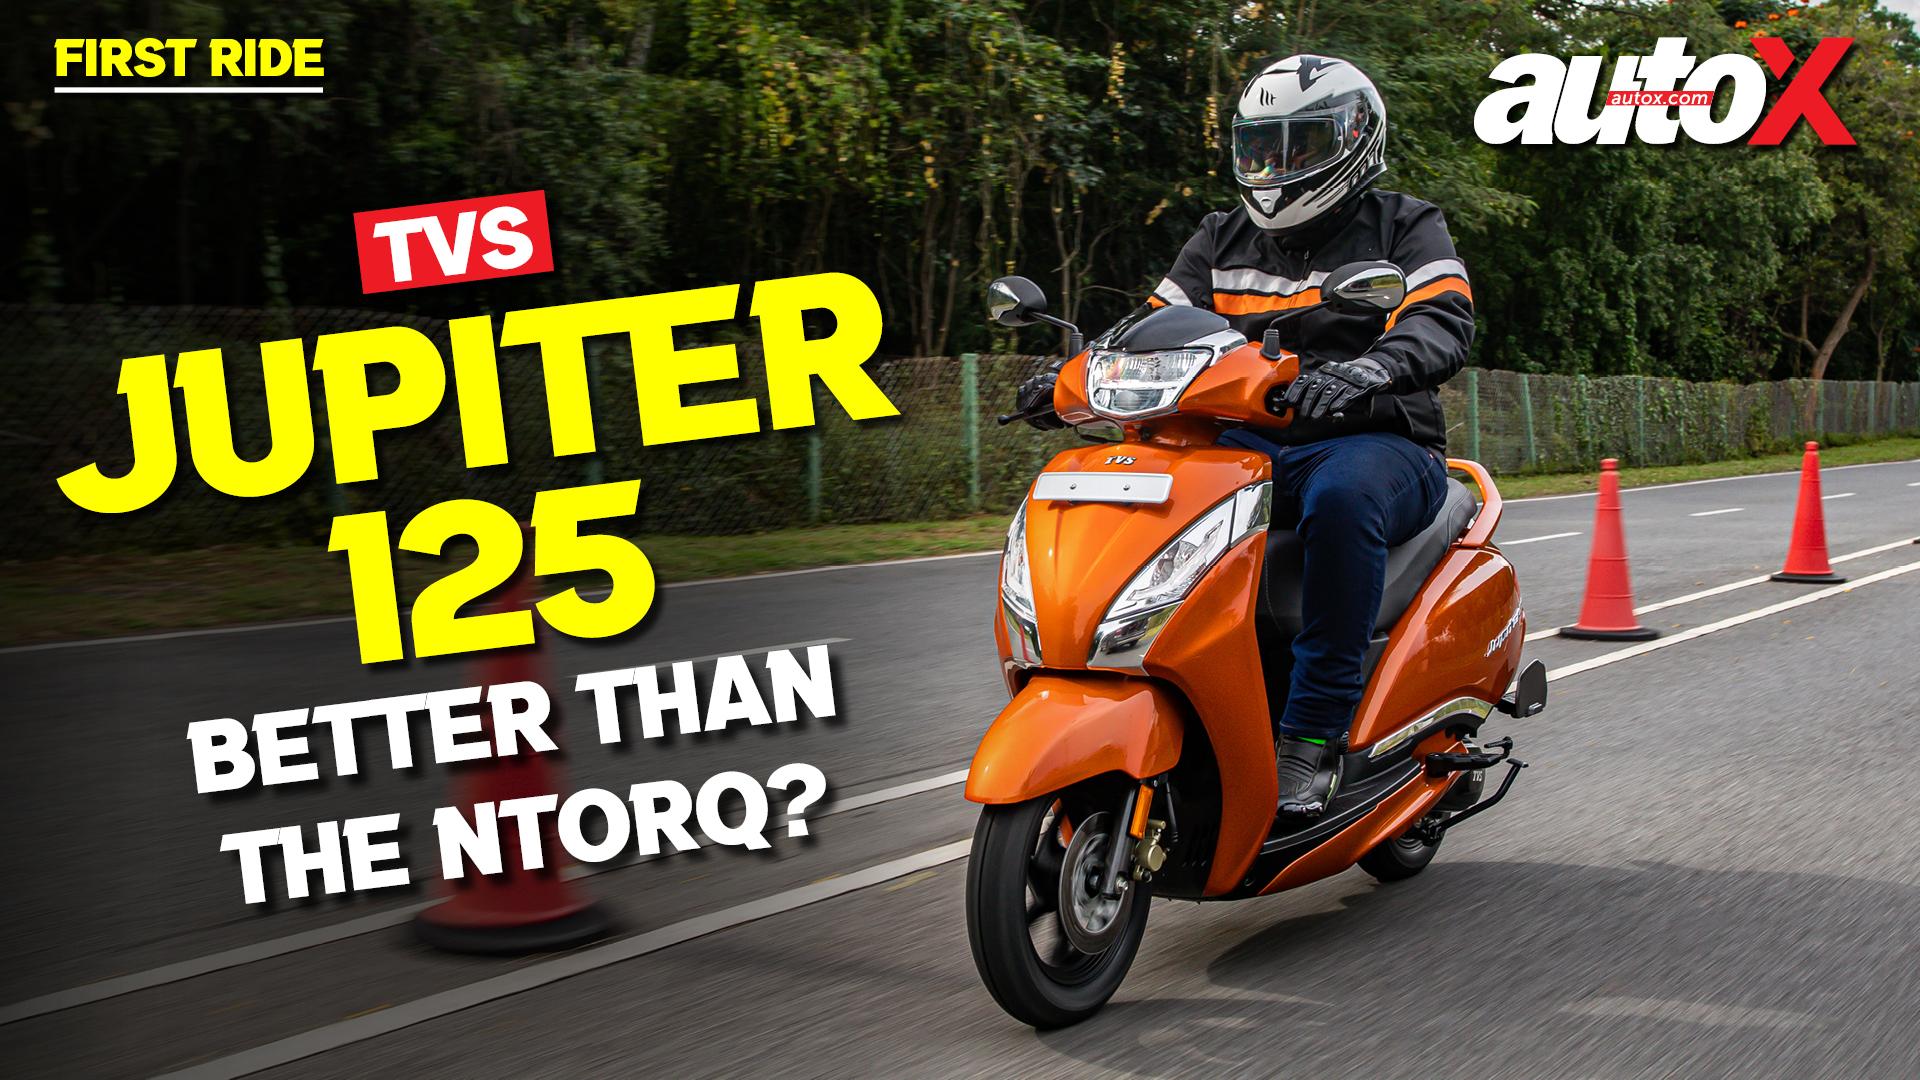 TVS Jupiter 125 Review – Better than the Ntorq? | First Ride | autoX